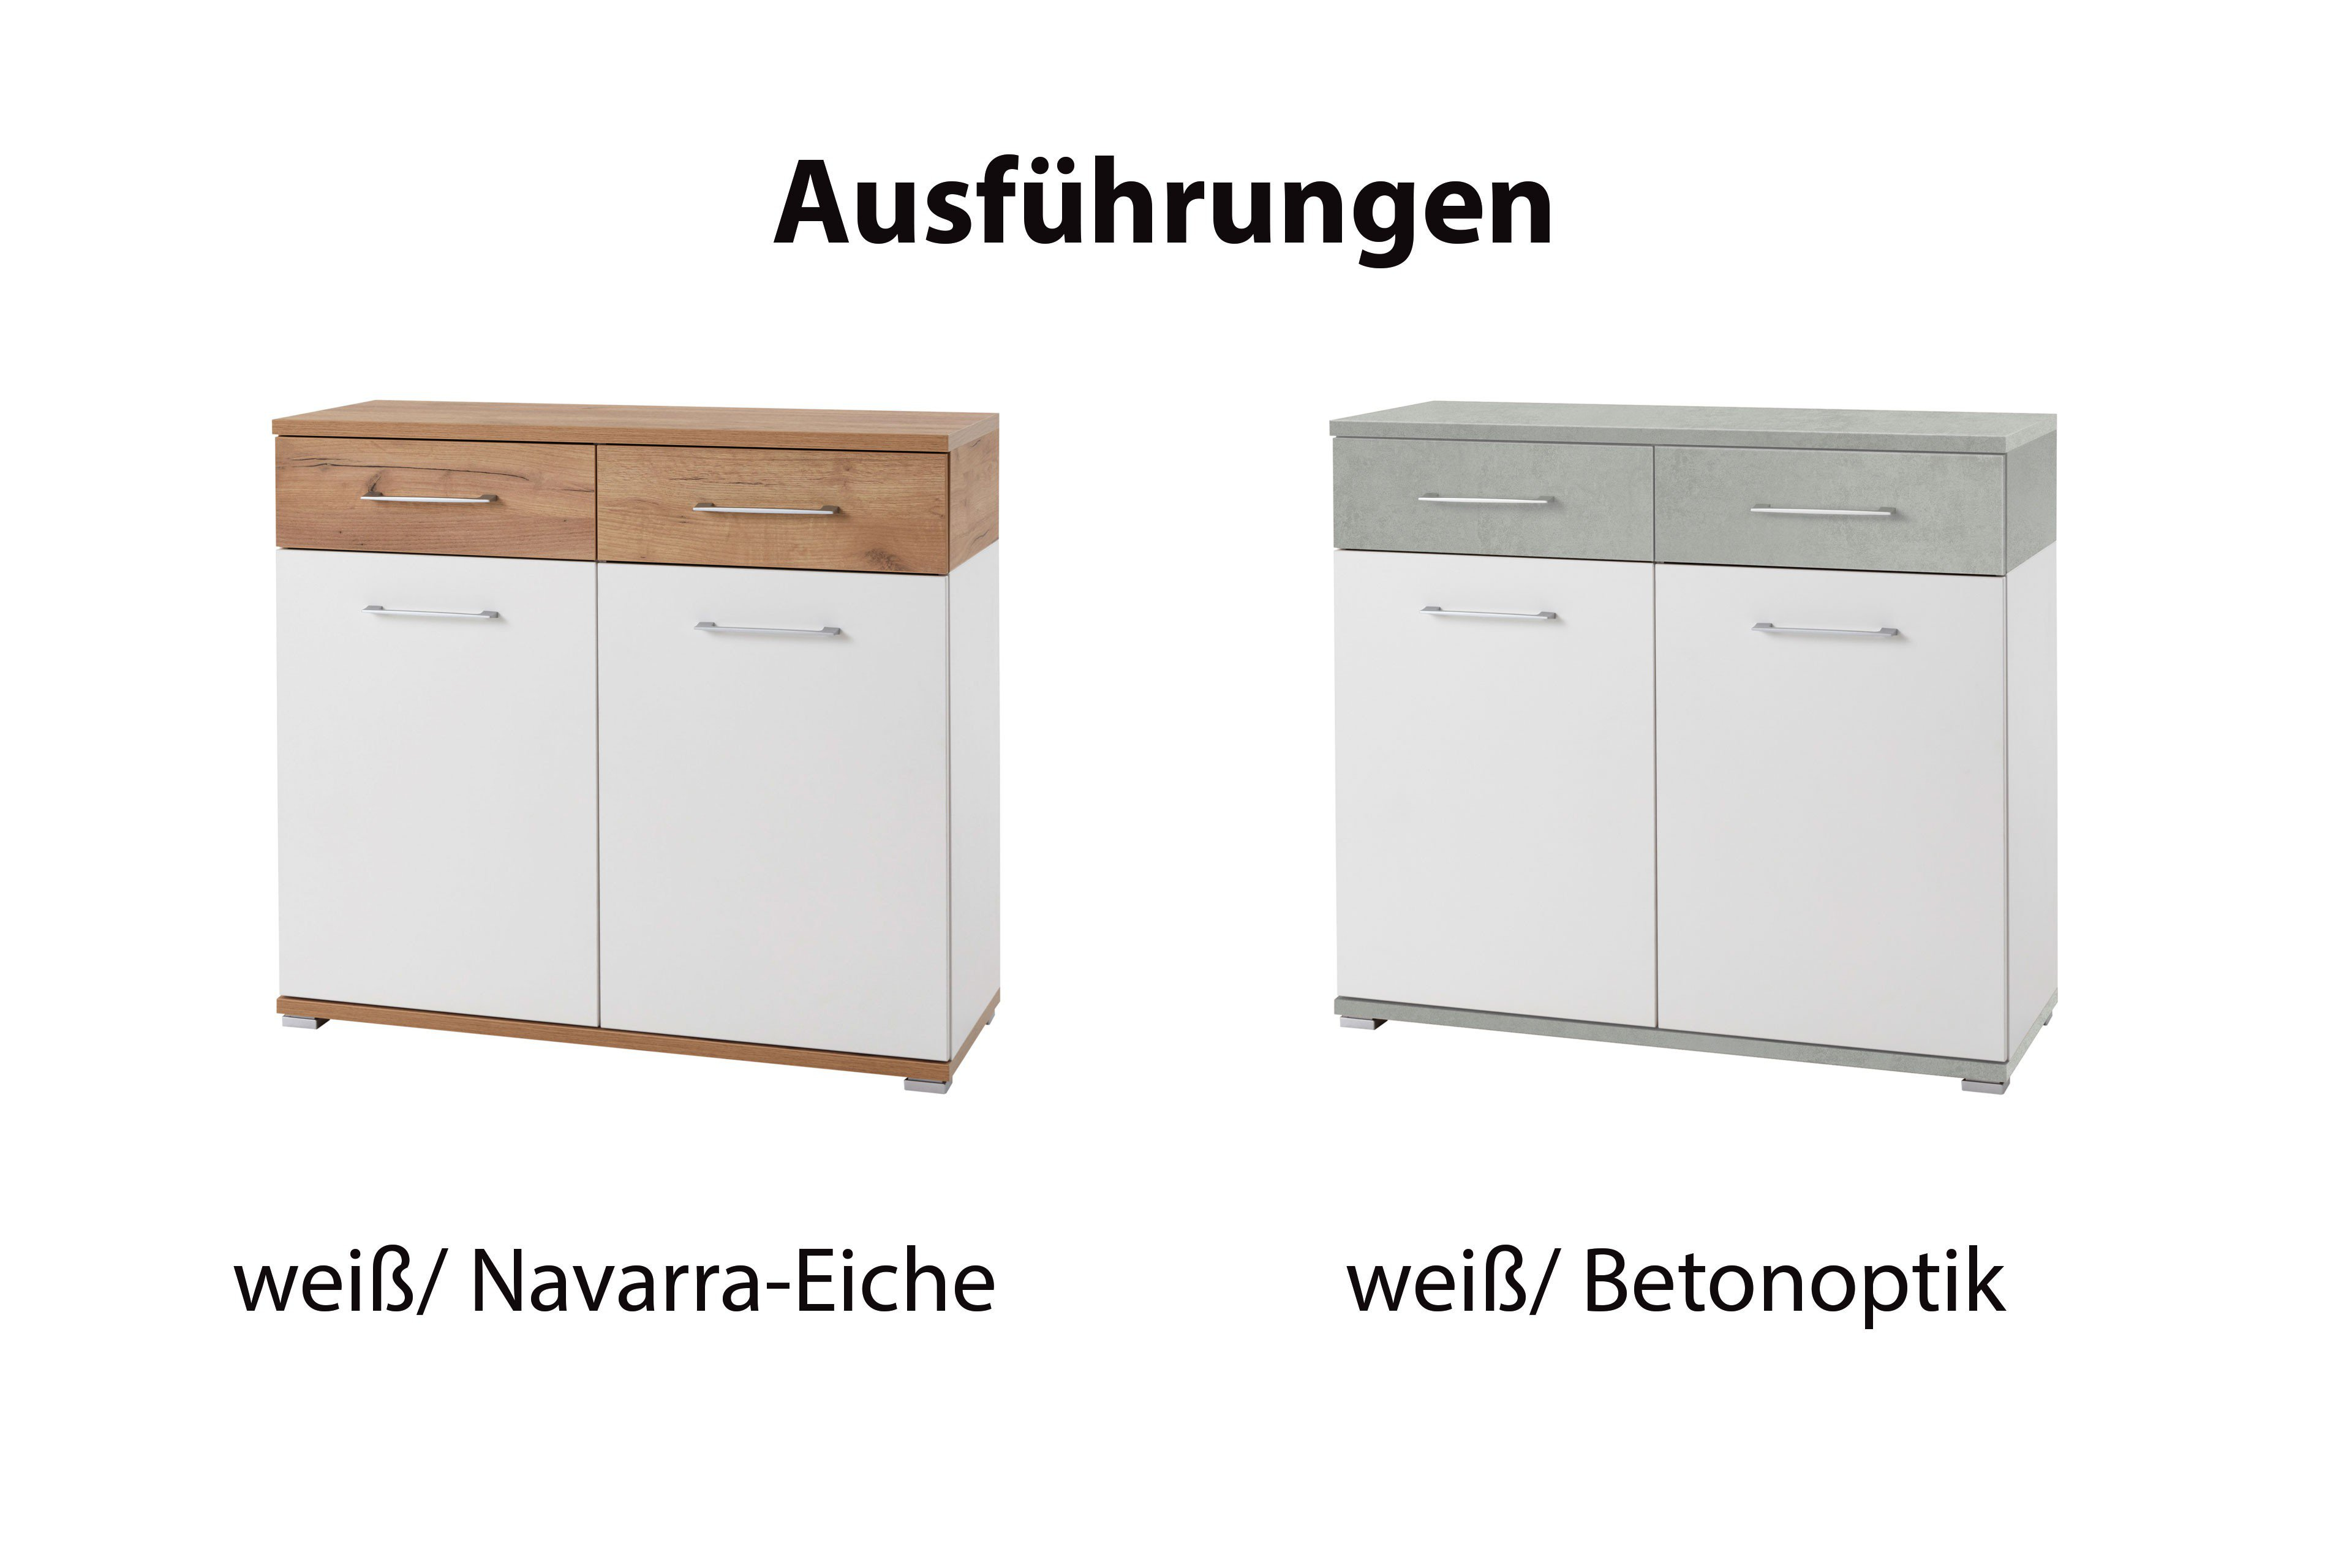 germania kommode gw topix wei beton m bel letz ihr online shop. Black Bedroom Furniture Sets. Home Design Ideas